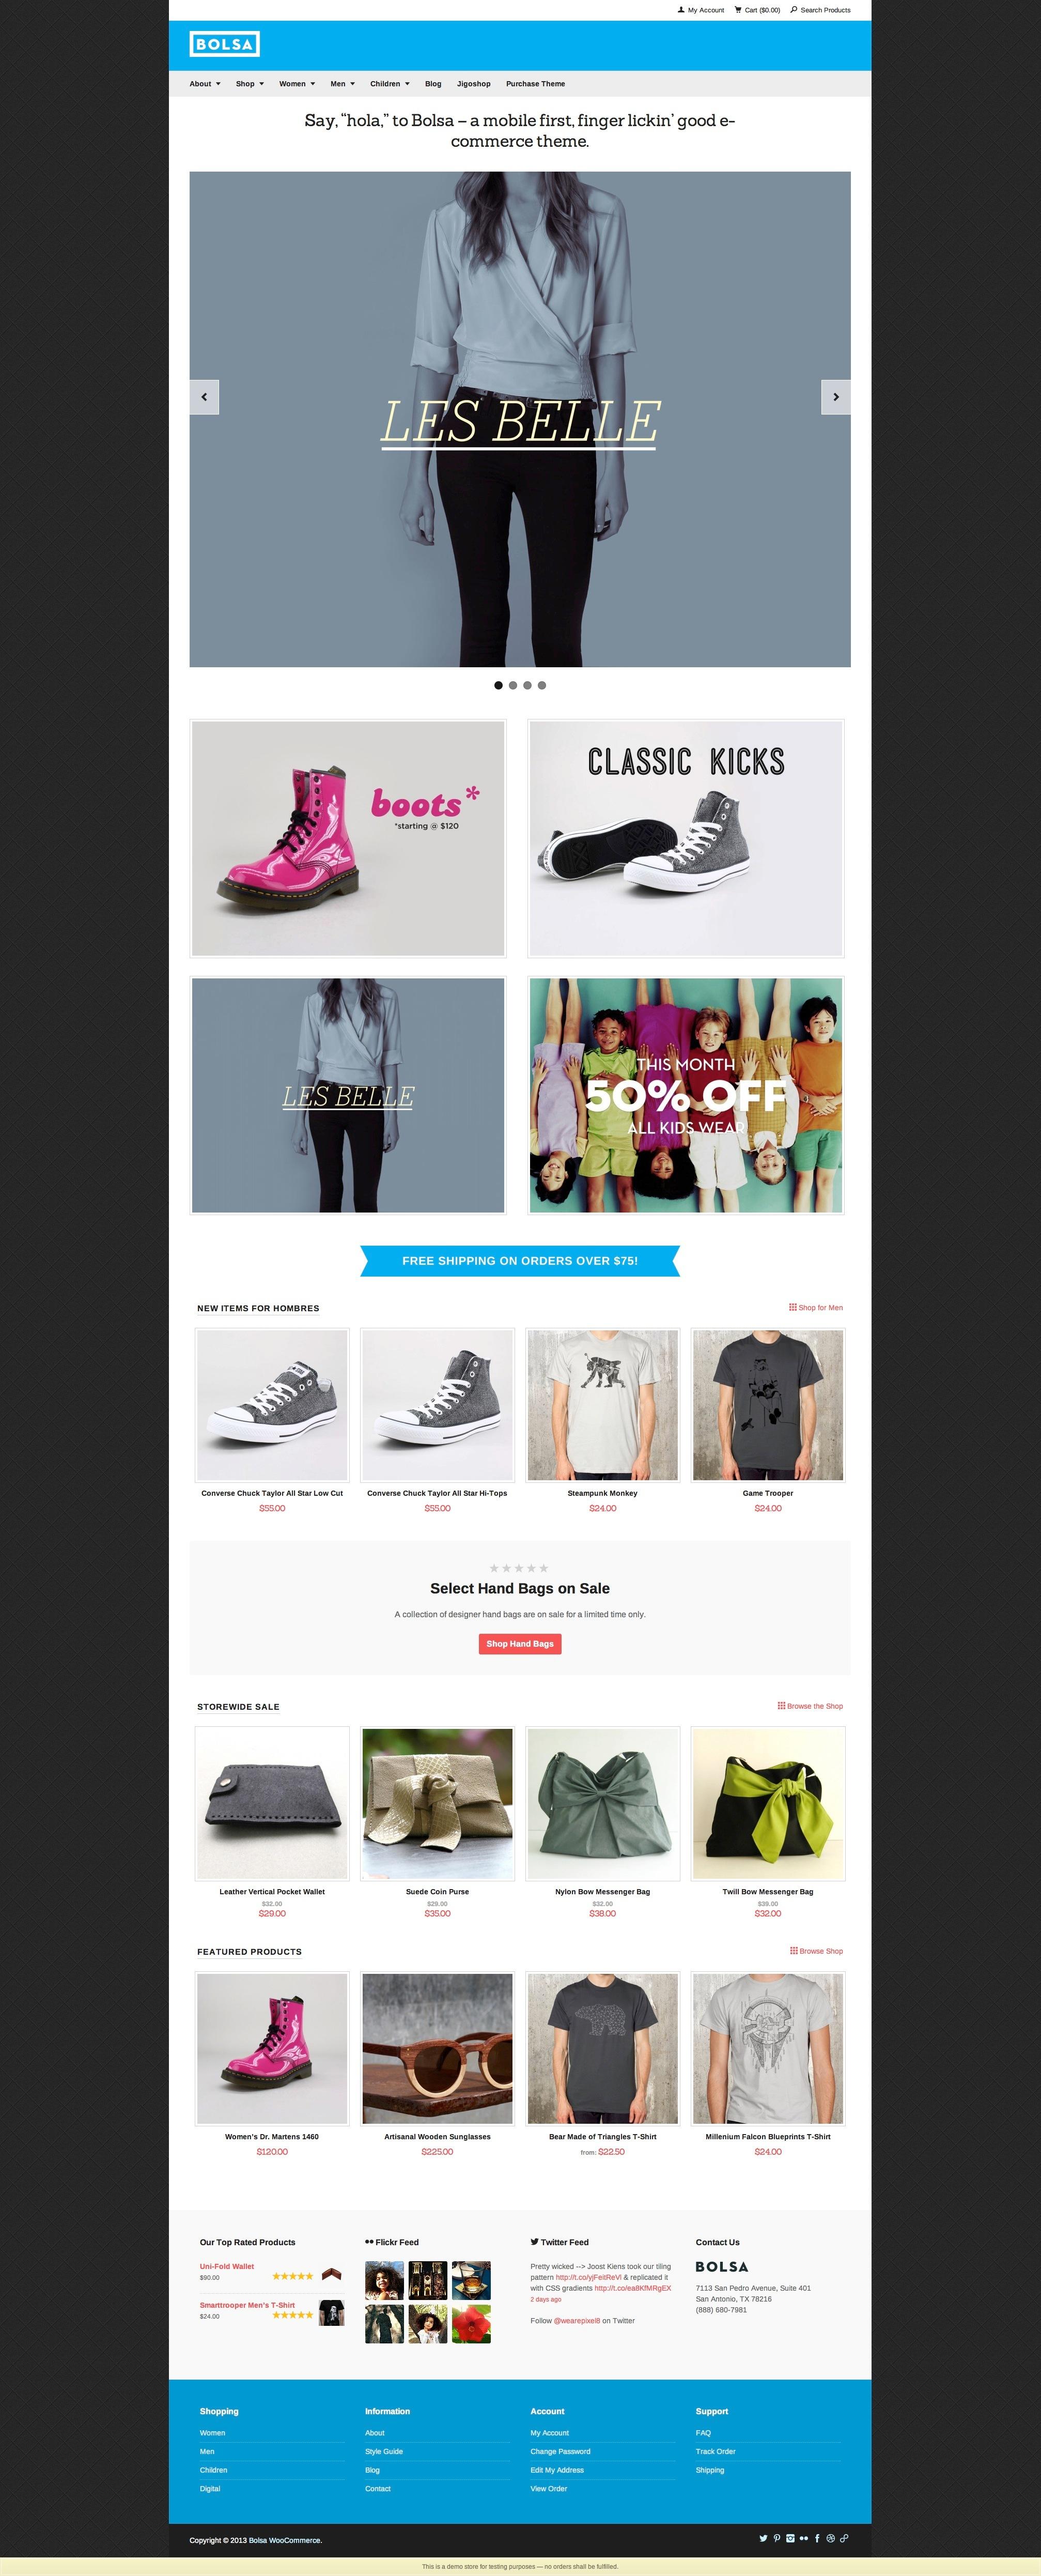 Bolsa A Responsive WordPress E-commerce Theme